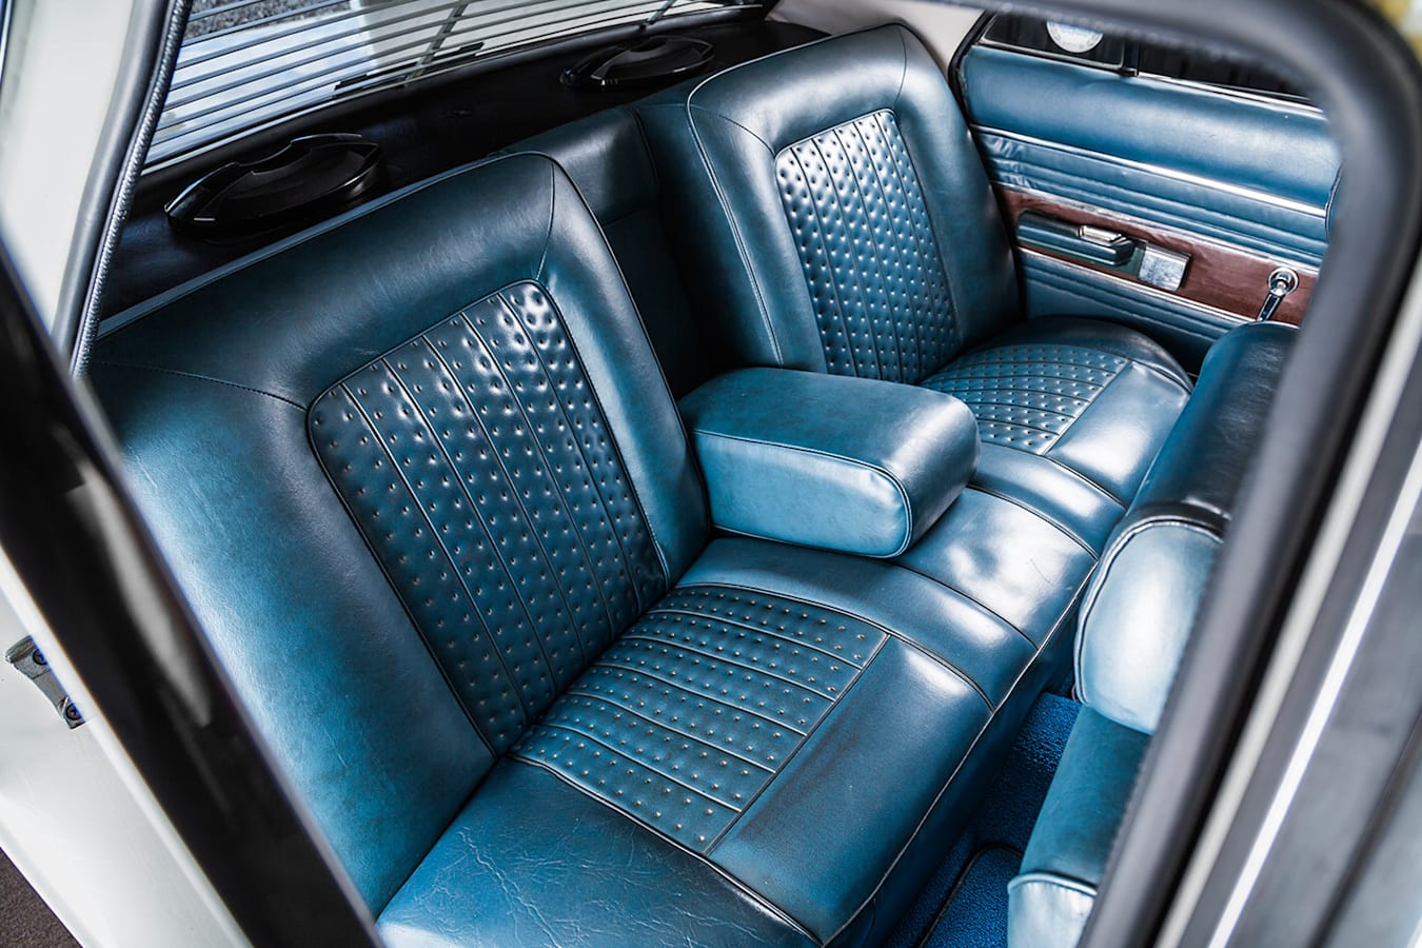 Chrysler Valiant interior rear